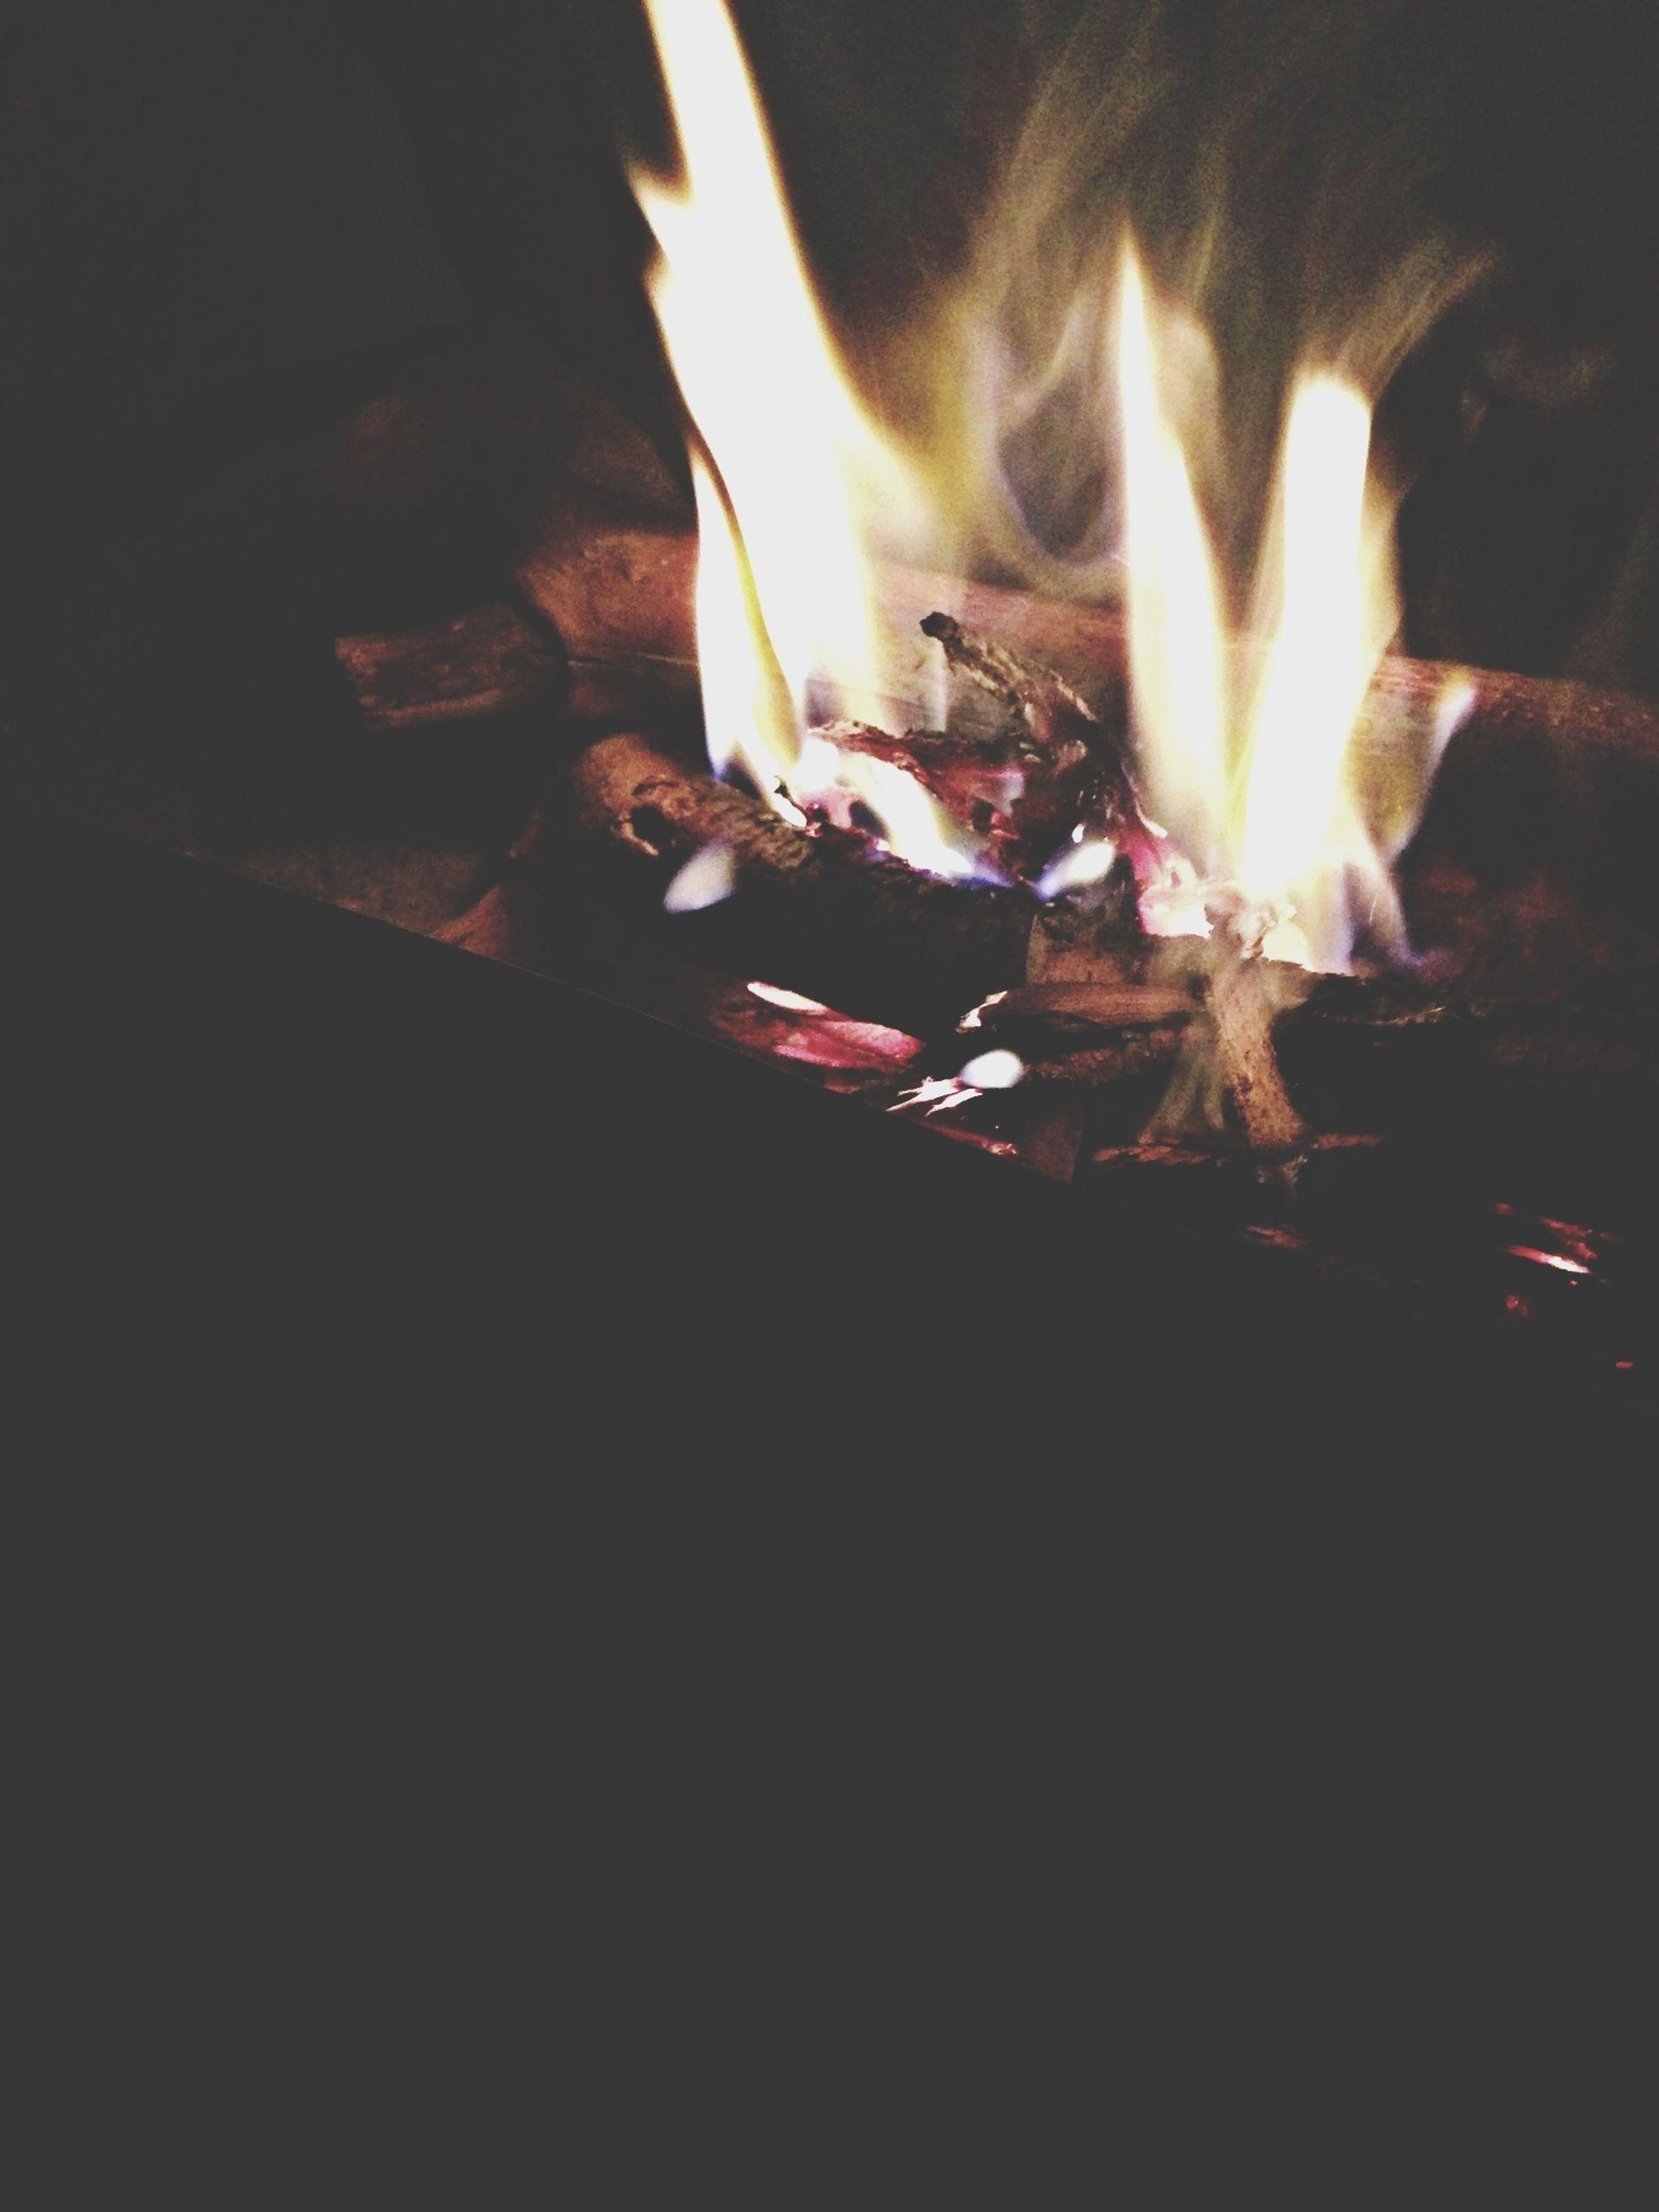 burning, flame, fire - natural phenomenon, heat - temperature, night, glowing, illuminated, fire, bonfire, dark, light - natural phenomenon, close-up, lit, motion, firewood, no people, indoors, heat, candle, orange color